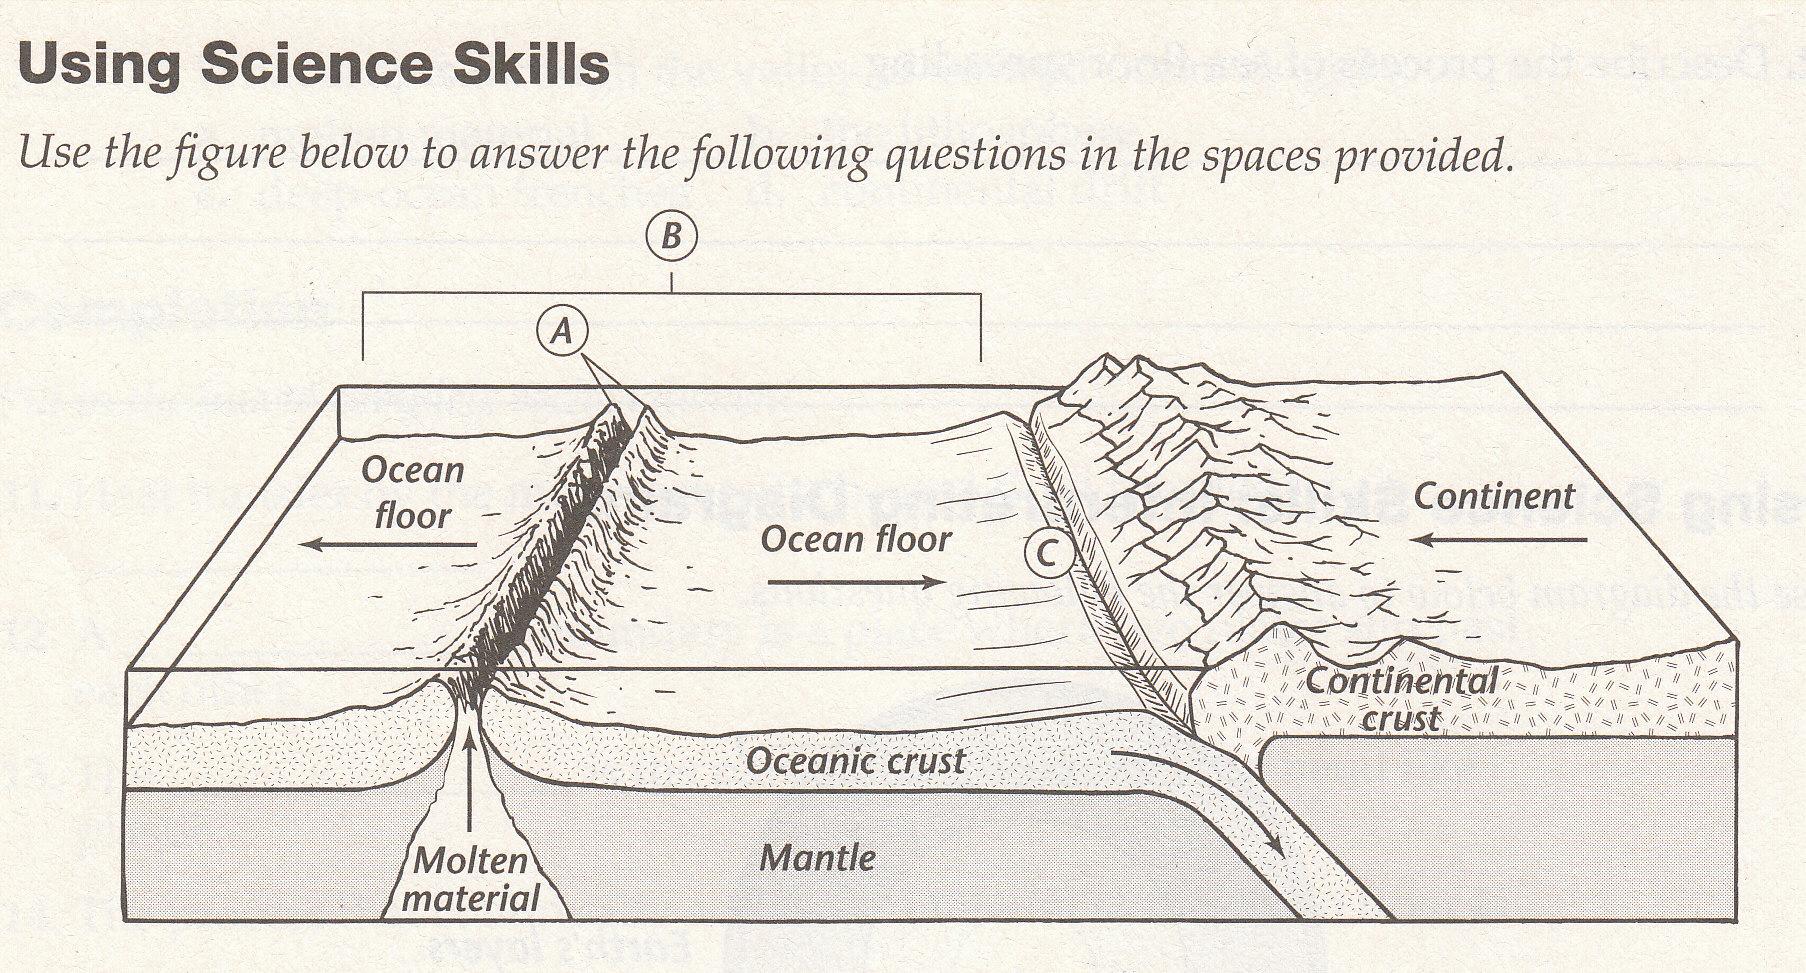 plate tectonics quizzes trivia questions answers proprofs quizzes. Black Bedroom Furniture Sets. Home Design Ideas